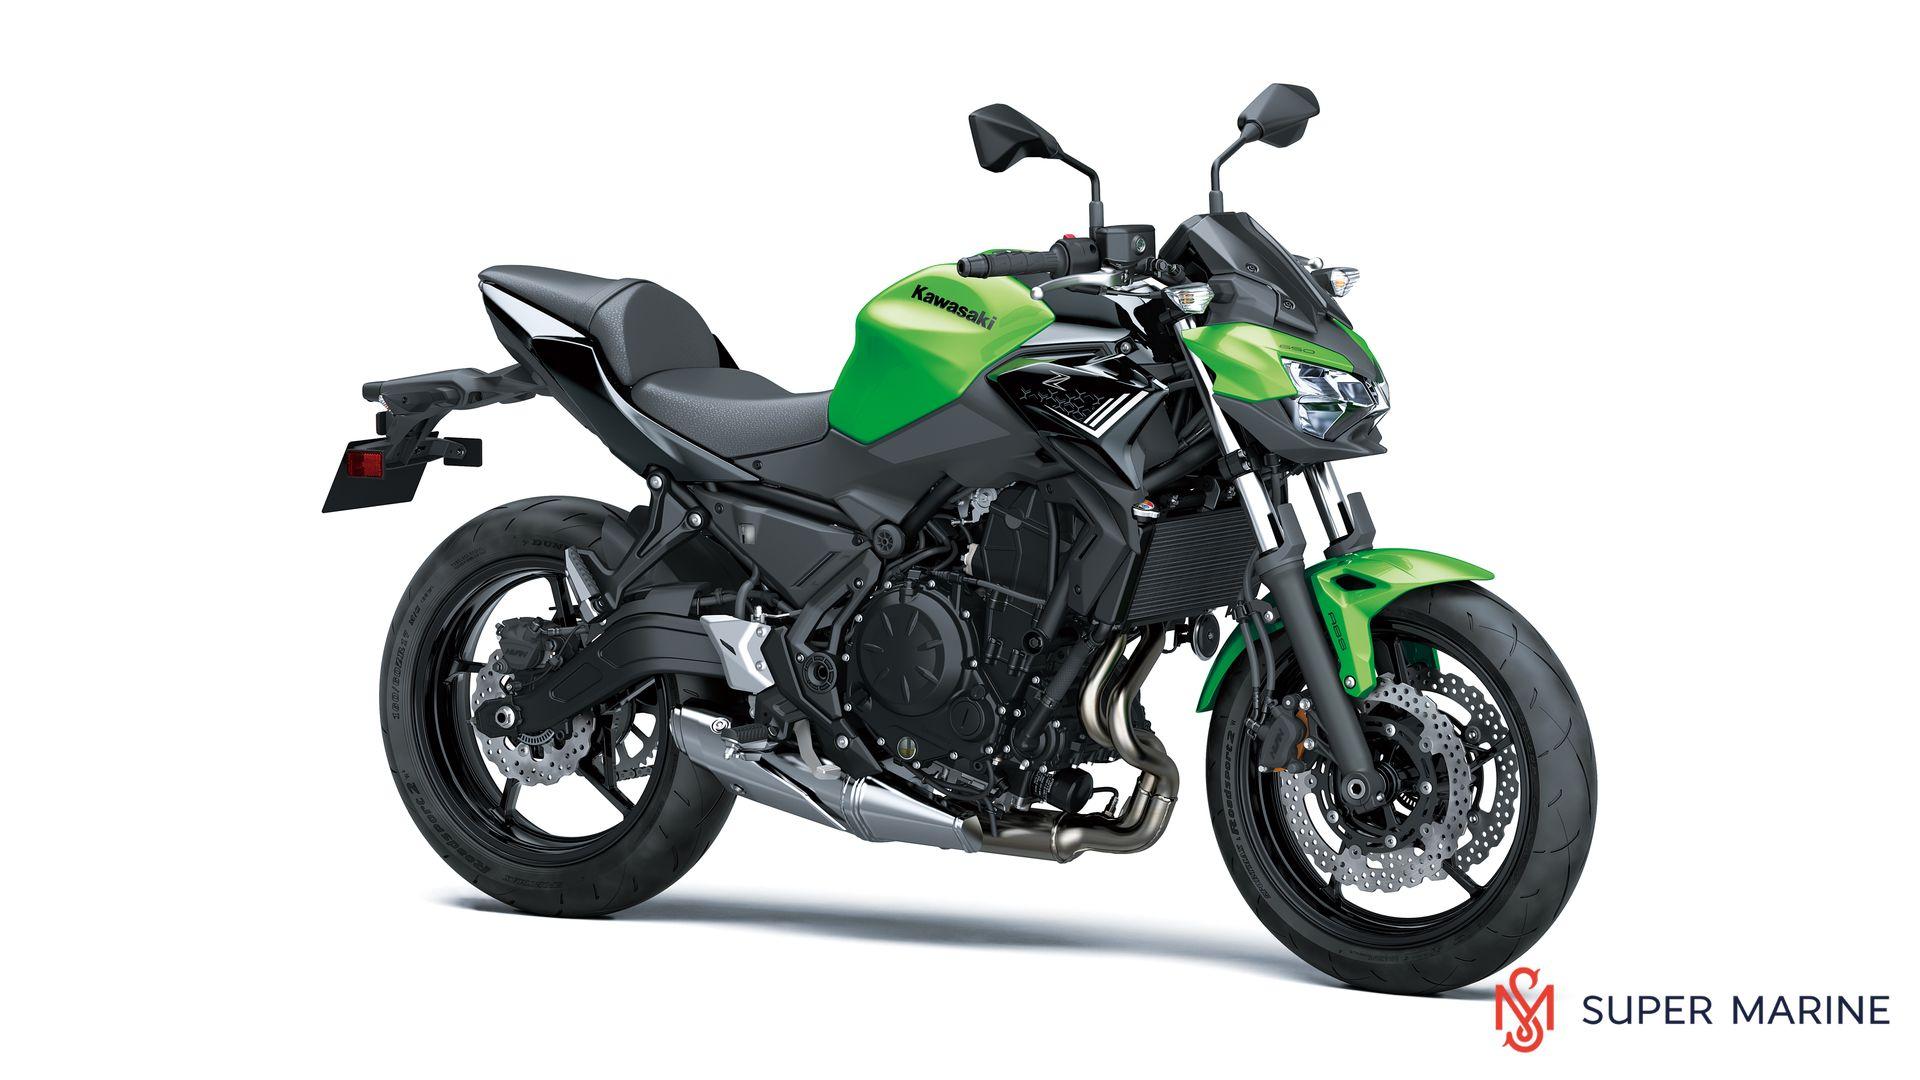 Мотоцикл Kawasaki Z650 ABS Зеленый 2020 - 1